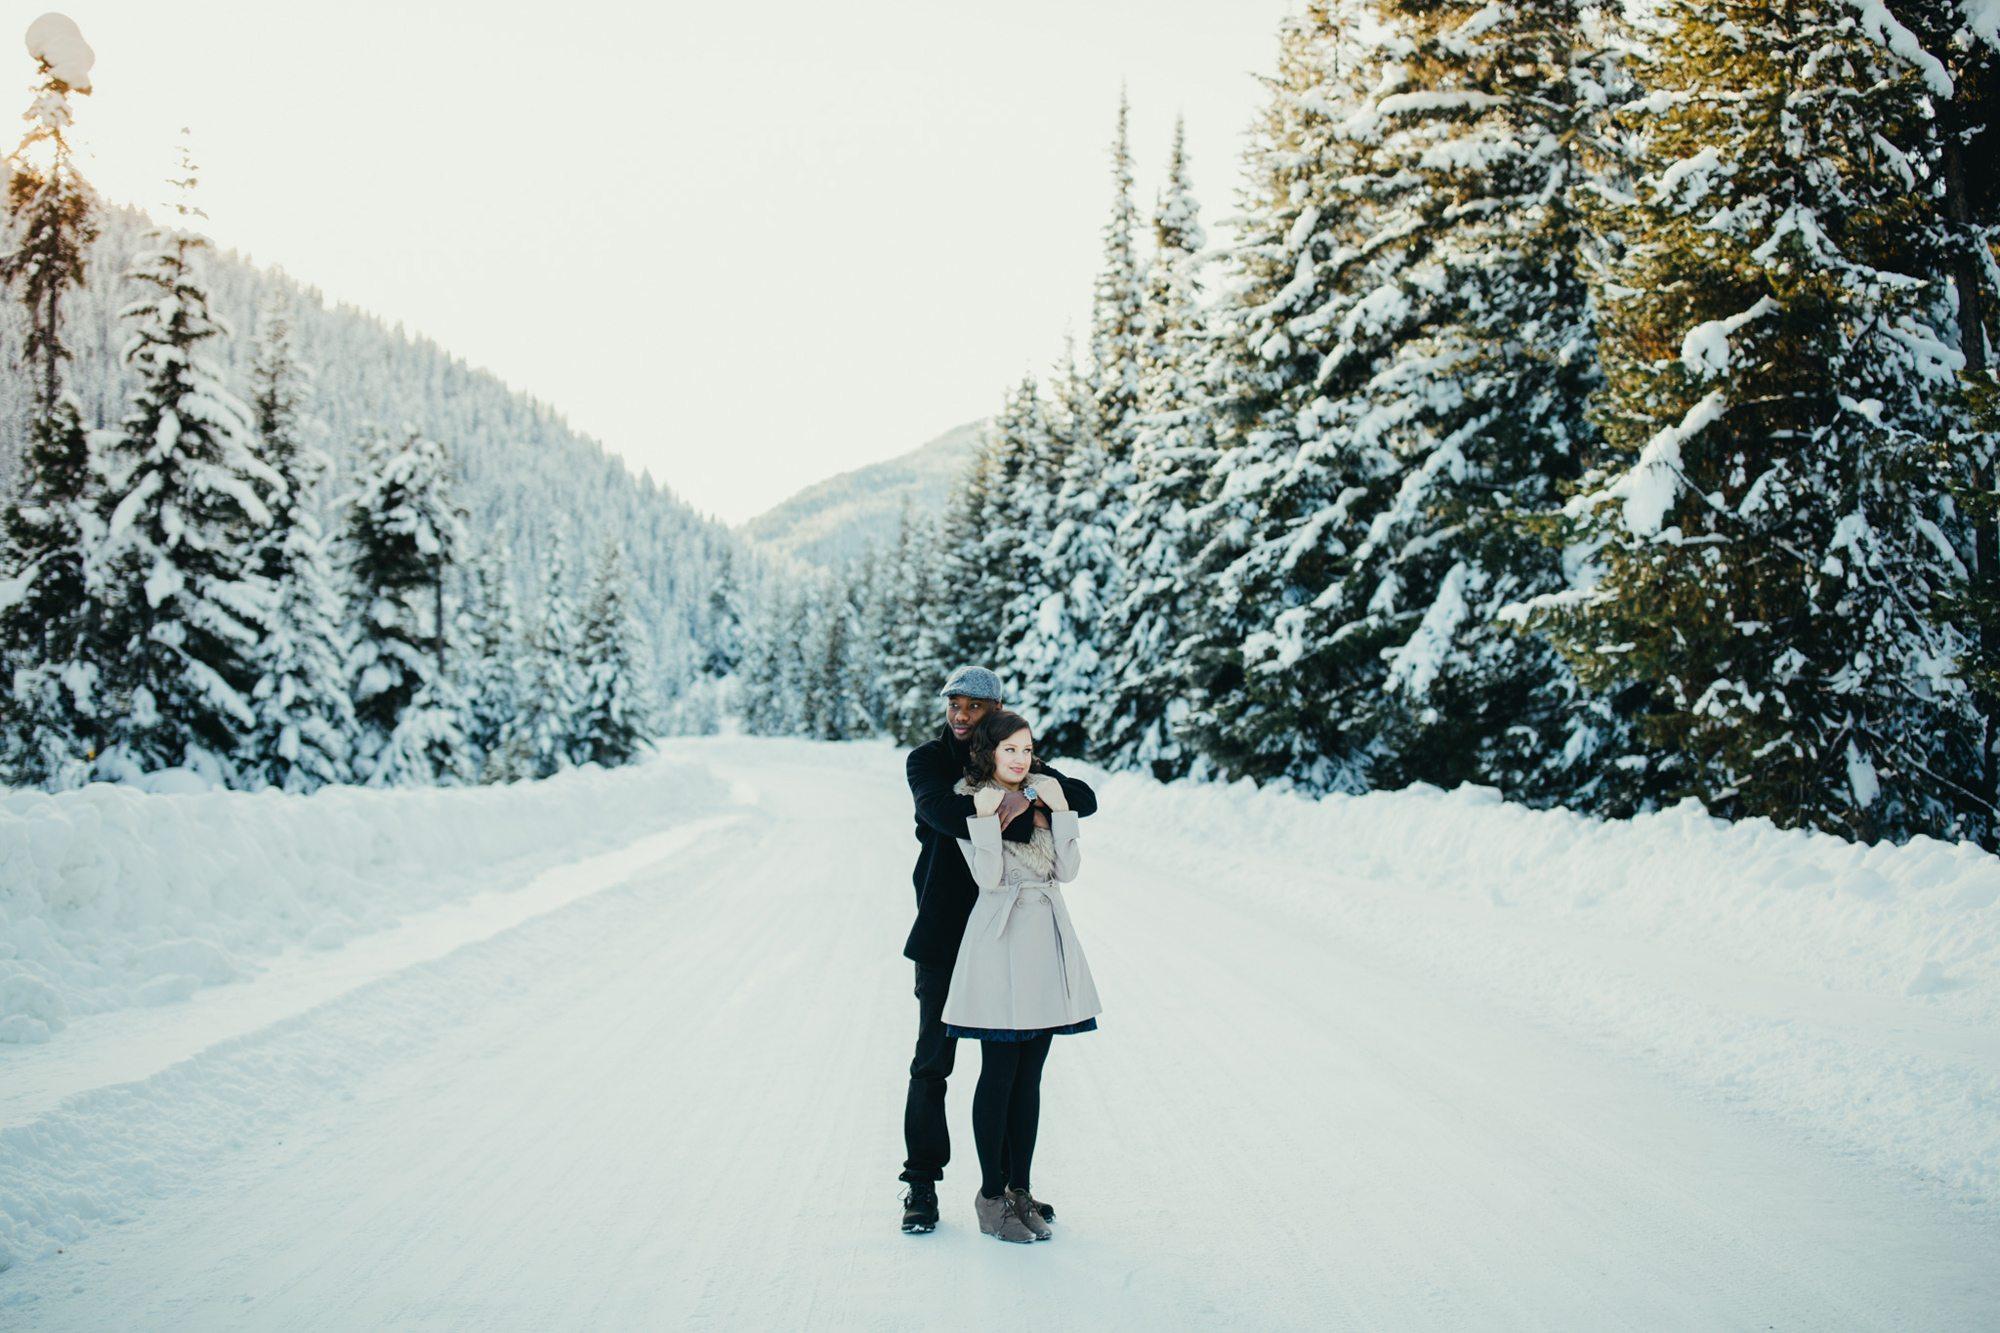 006-adventure-engagement-photographer